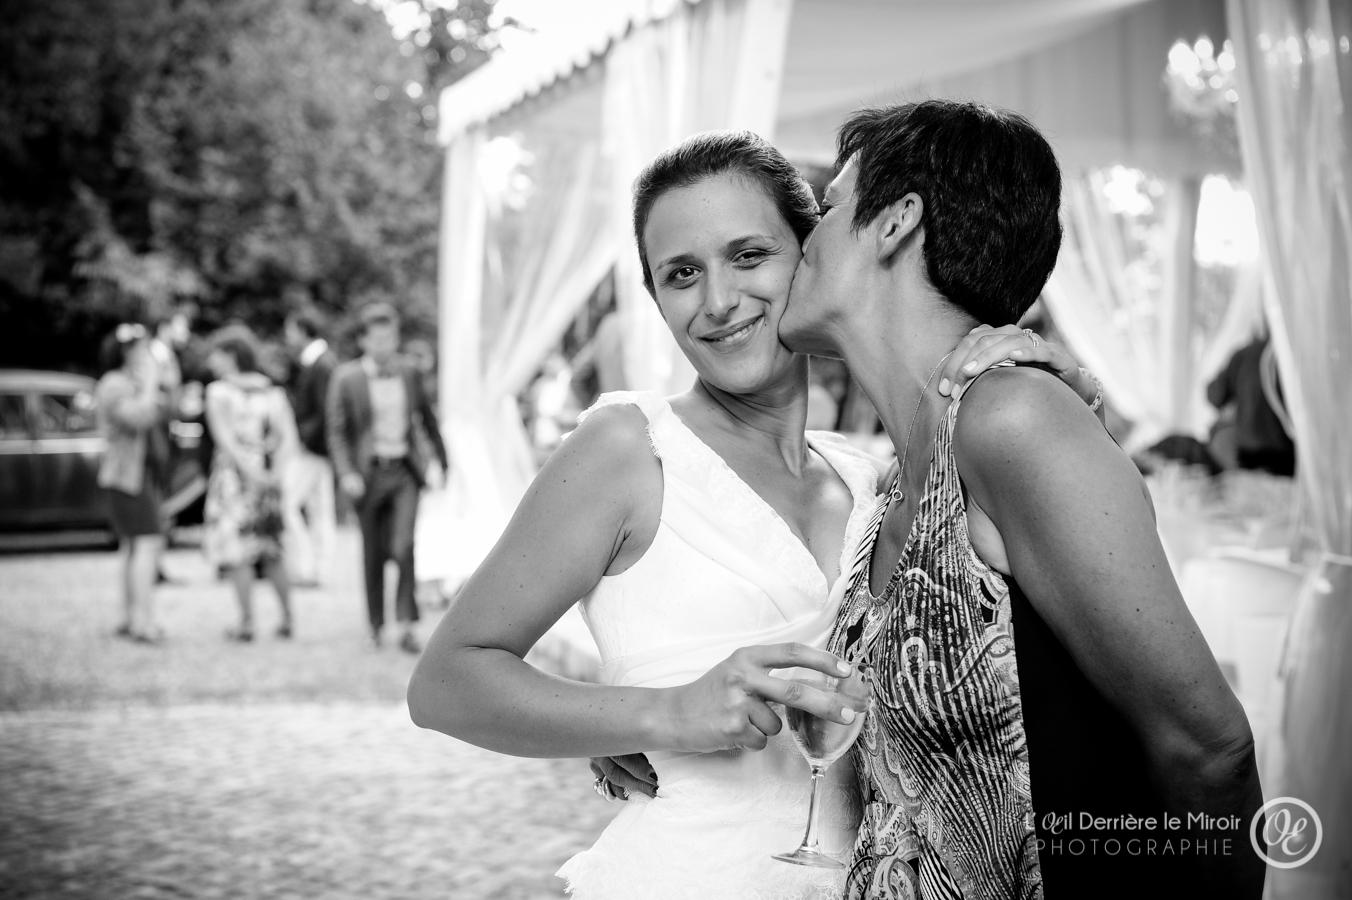 Photographe-Mariage-grasse-loeilderrierelemiroir-jt-112